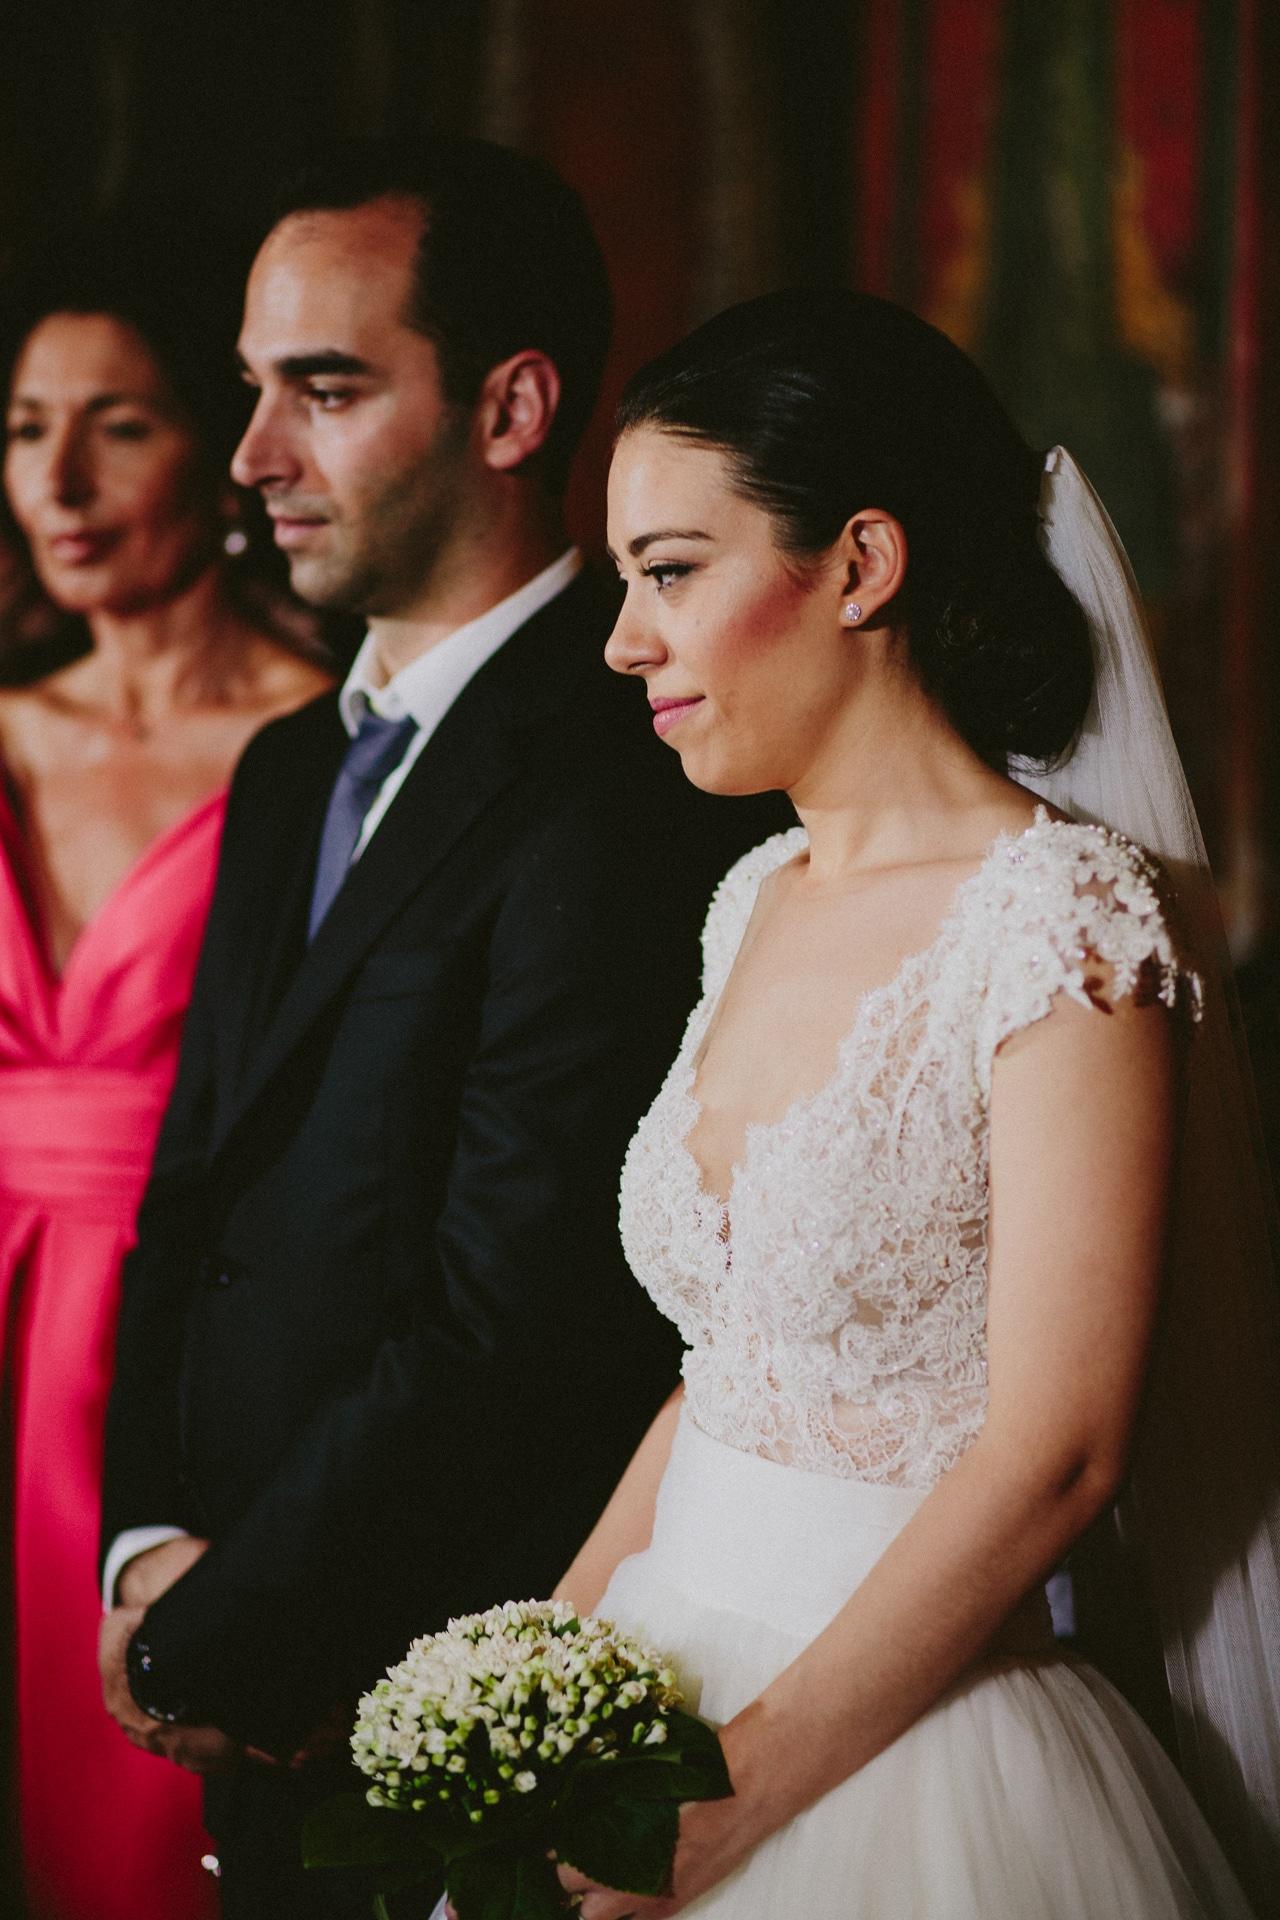 Traditional wedding at Meteora